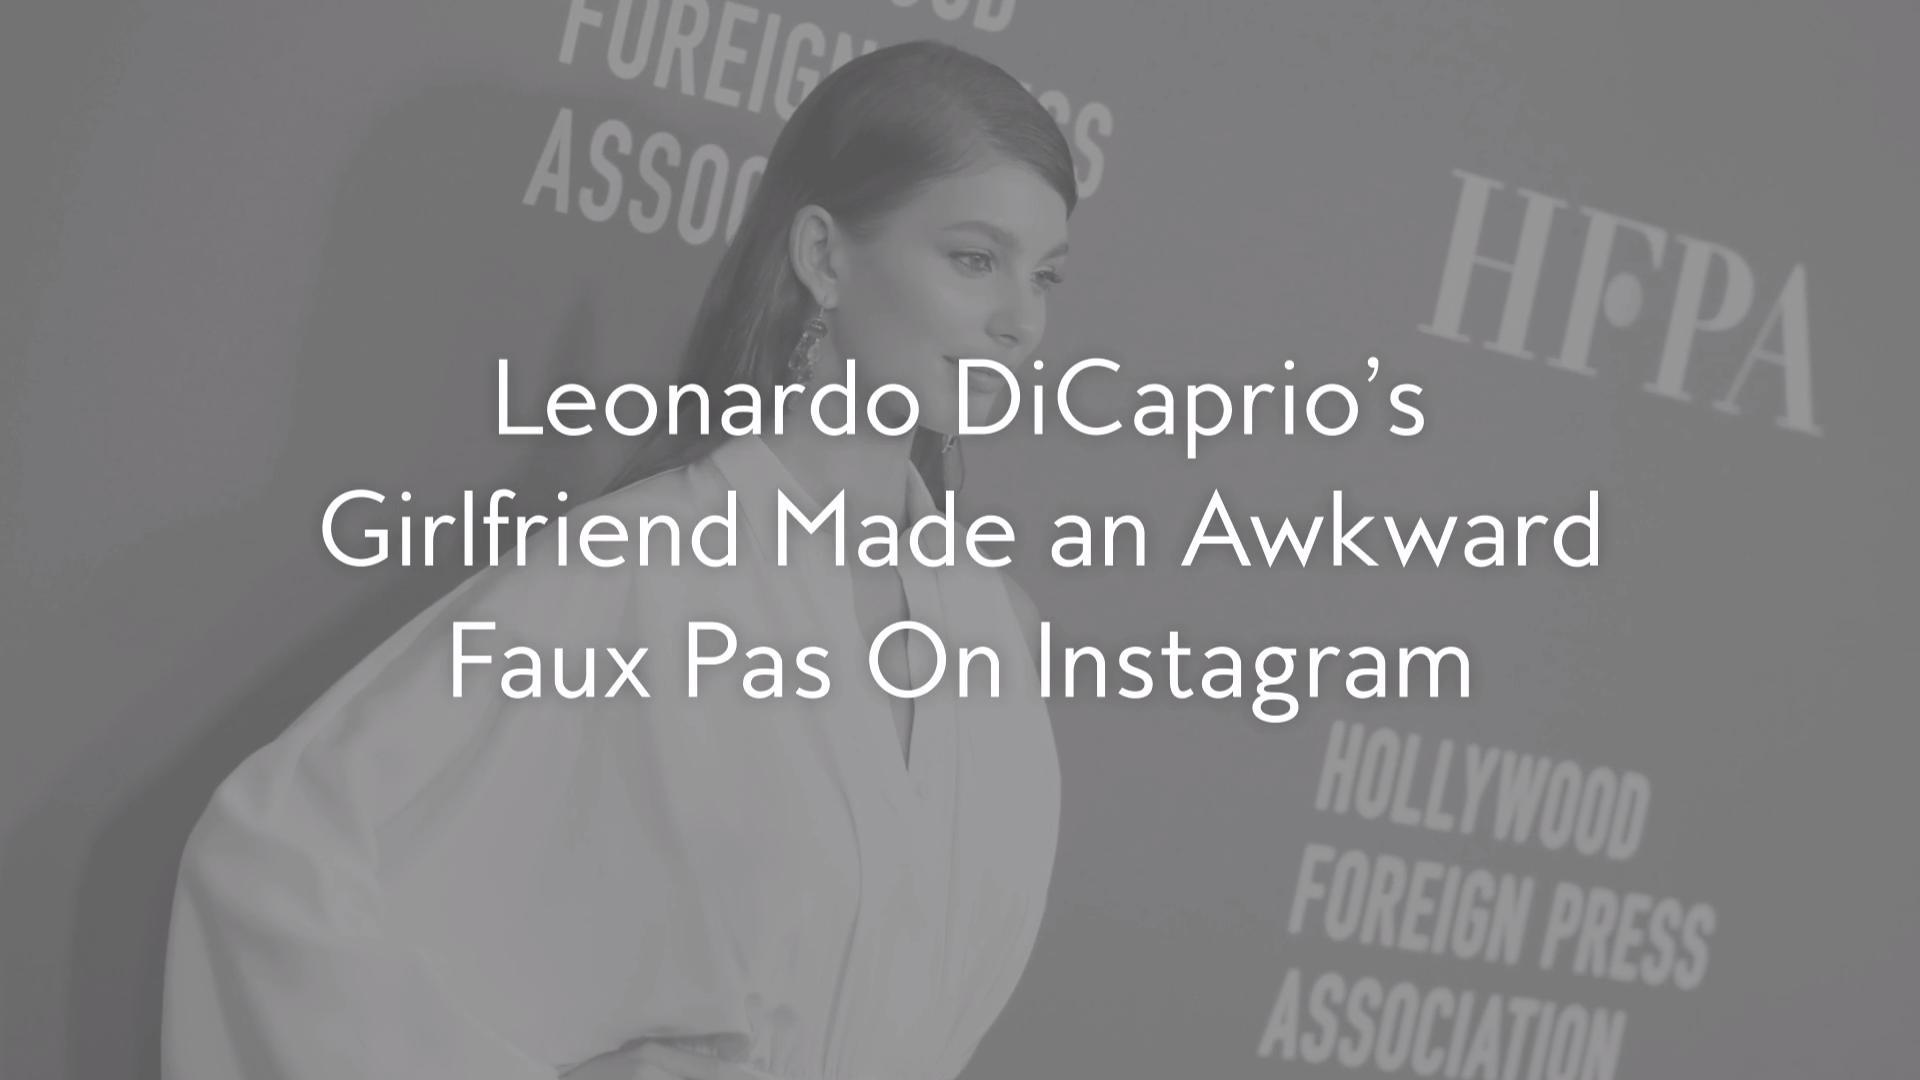 Leonardo DiCaprio's Girlfriend Made an Awkward Faux Pas On Instagram